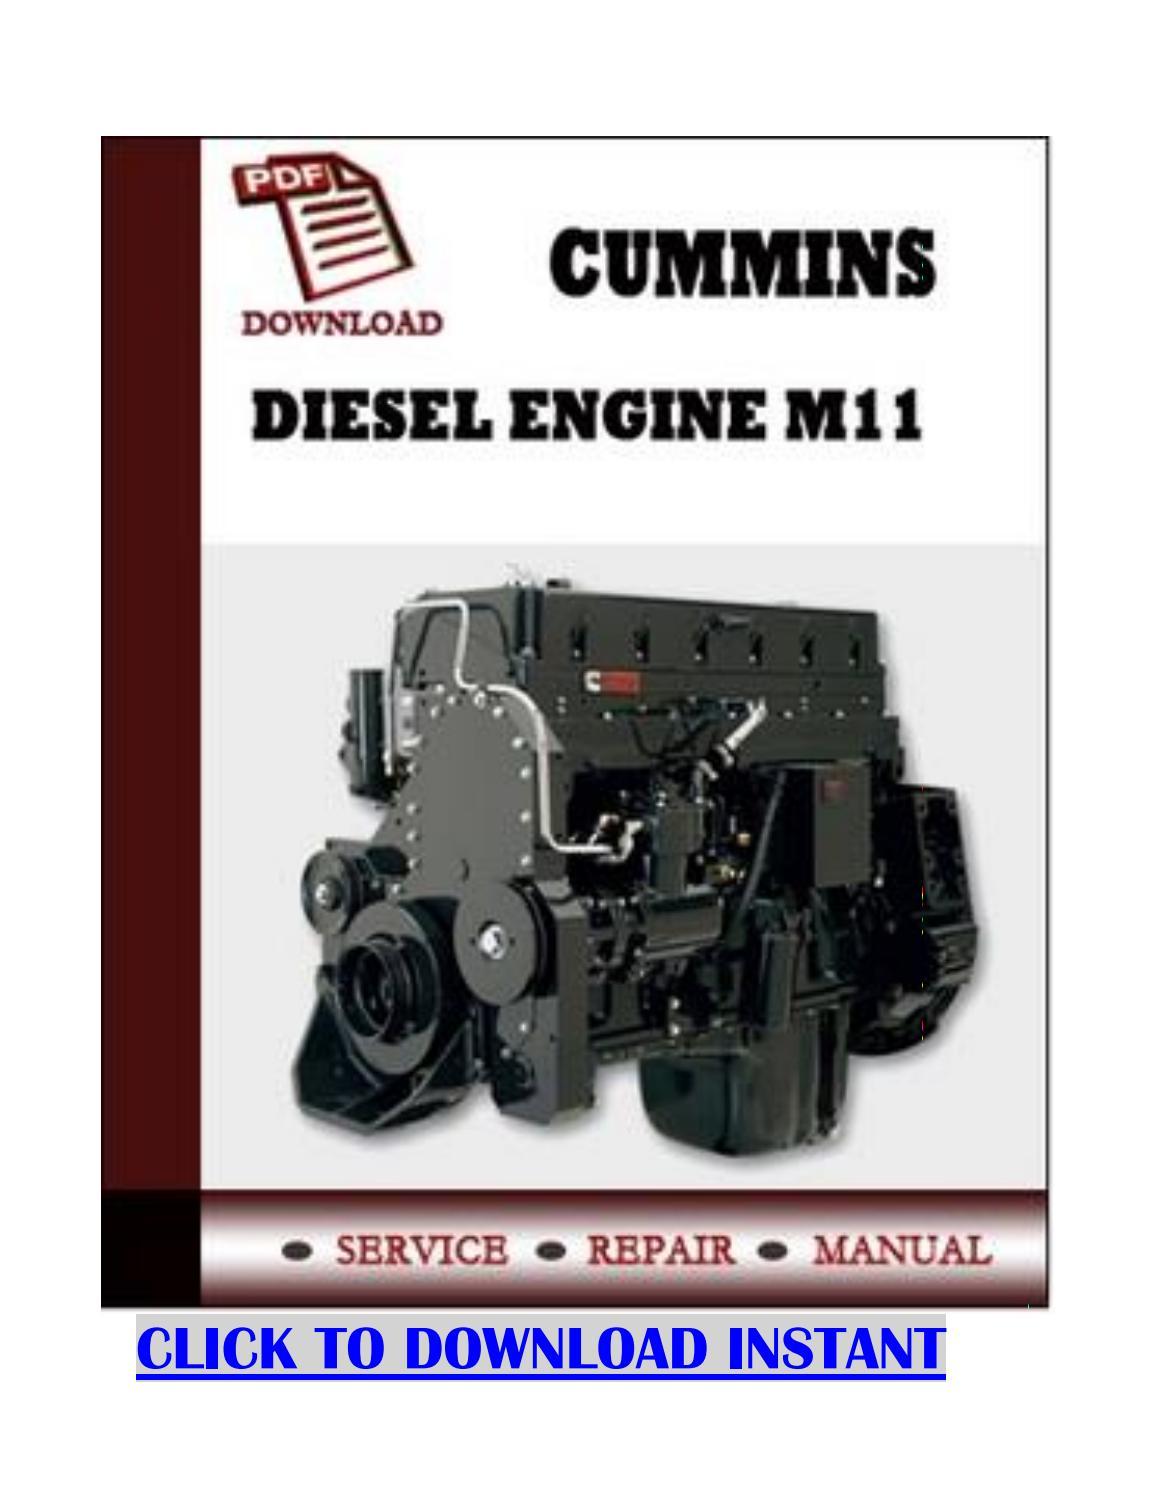 Cummins m11 plus repair service manual for diesel engine by YordanJordan -  issuu